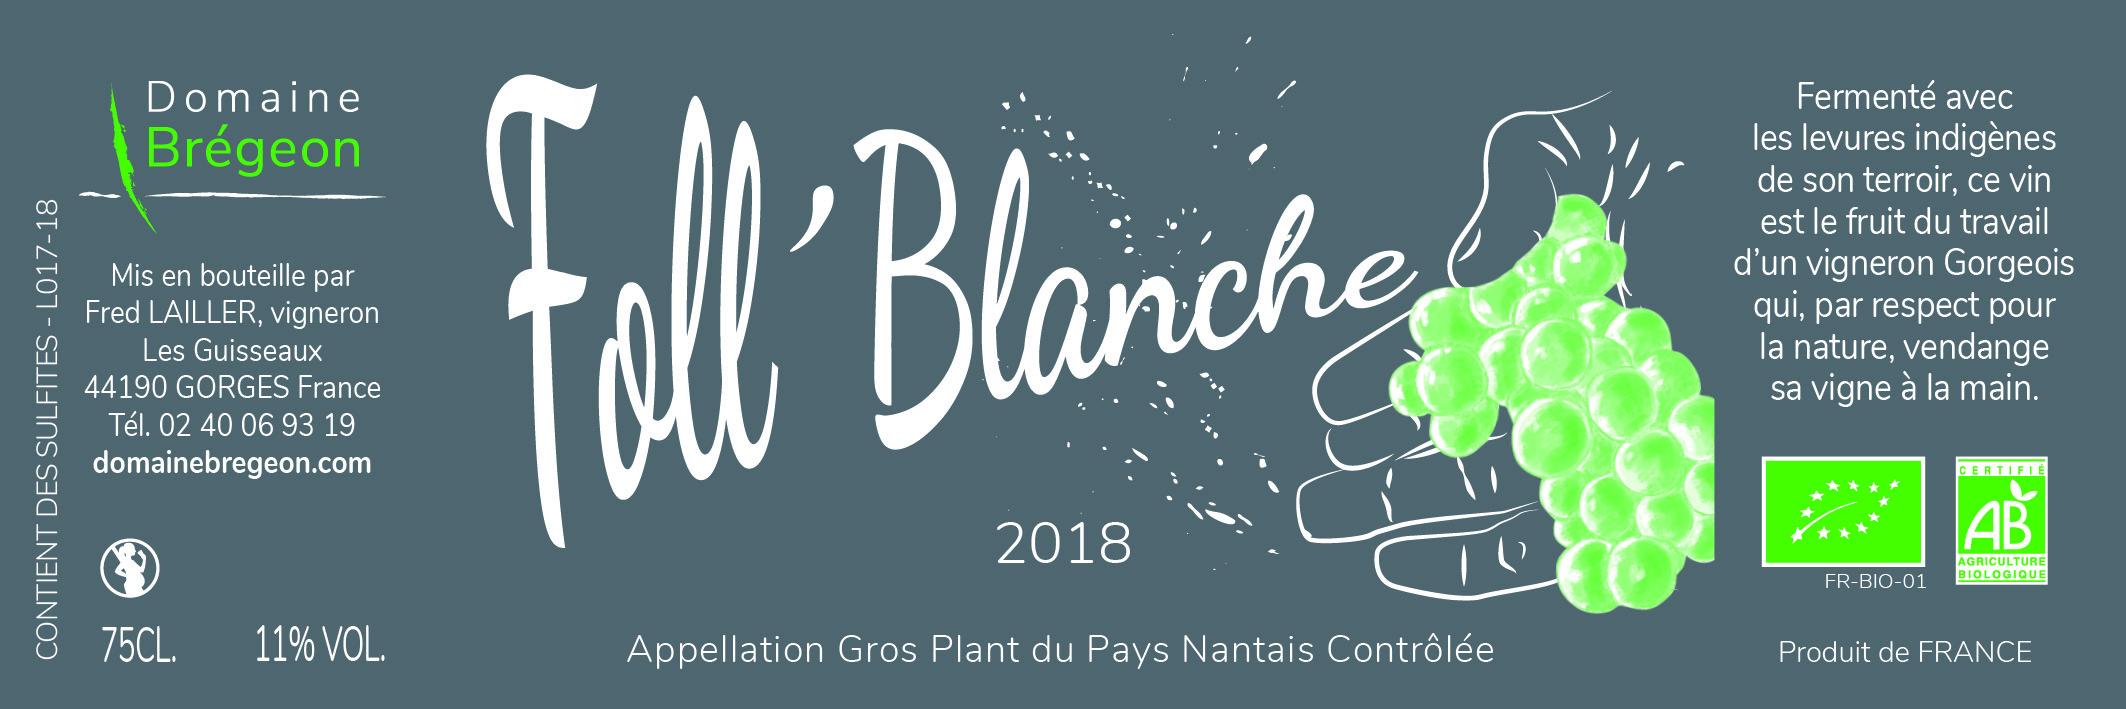 Foll'Blanche, Domaine Brégeon